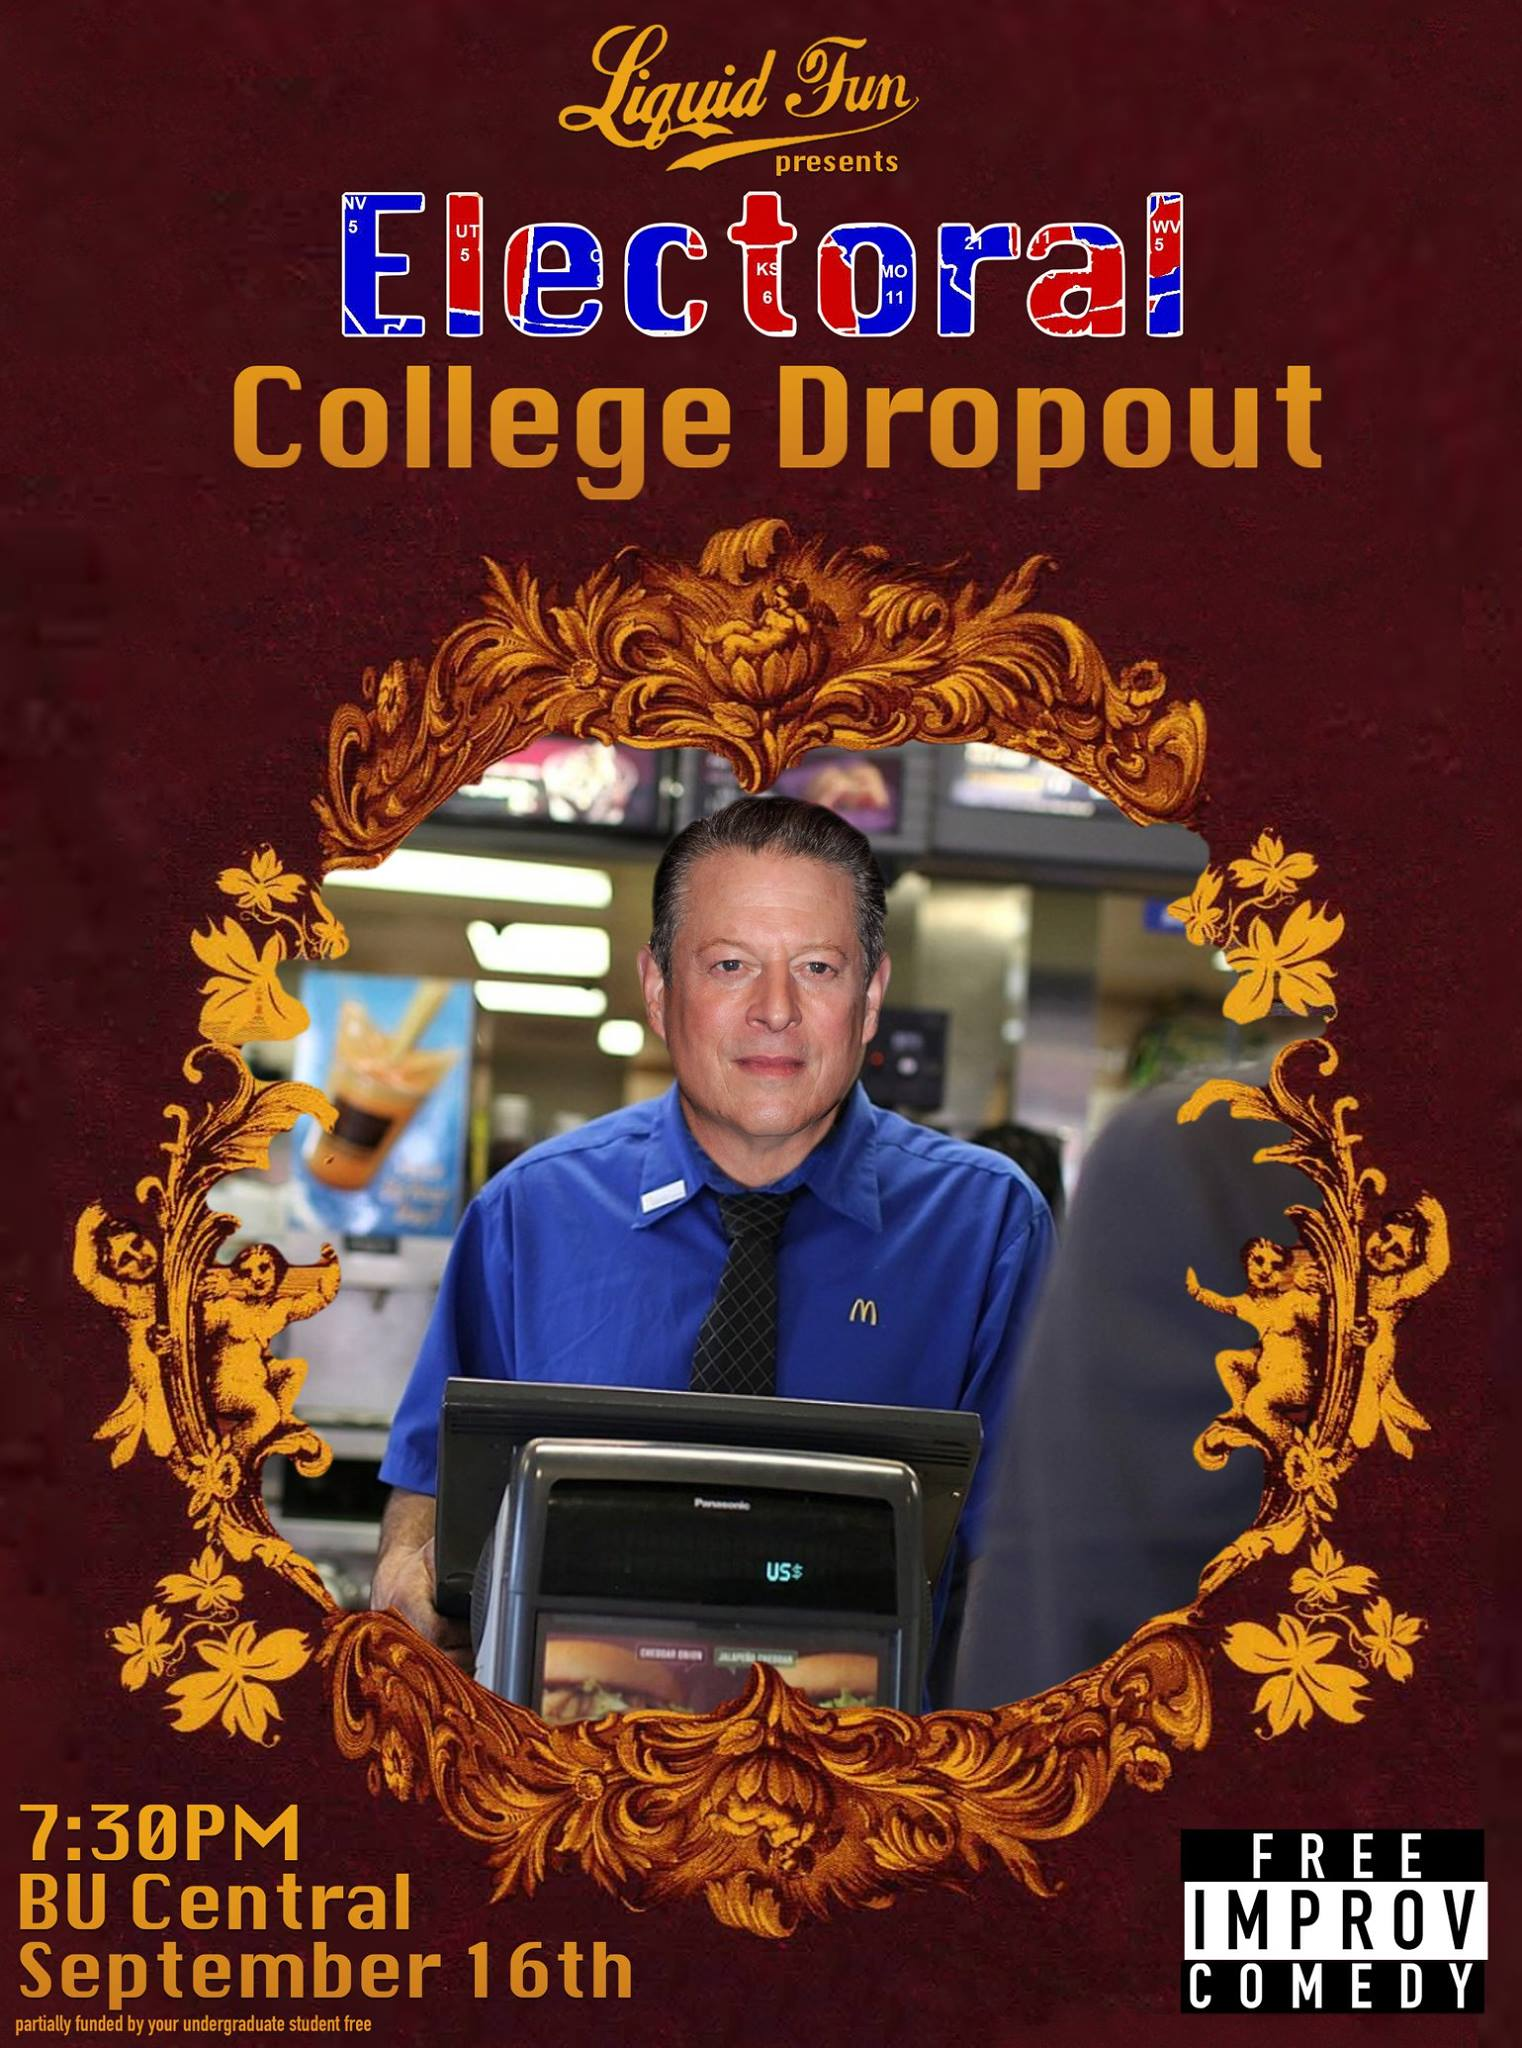 Electoral College Dropout